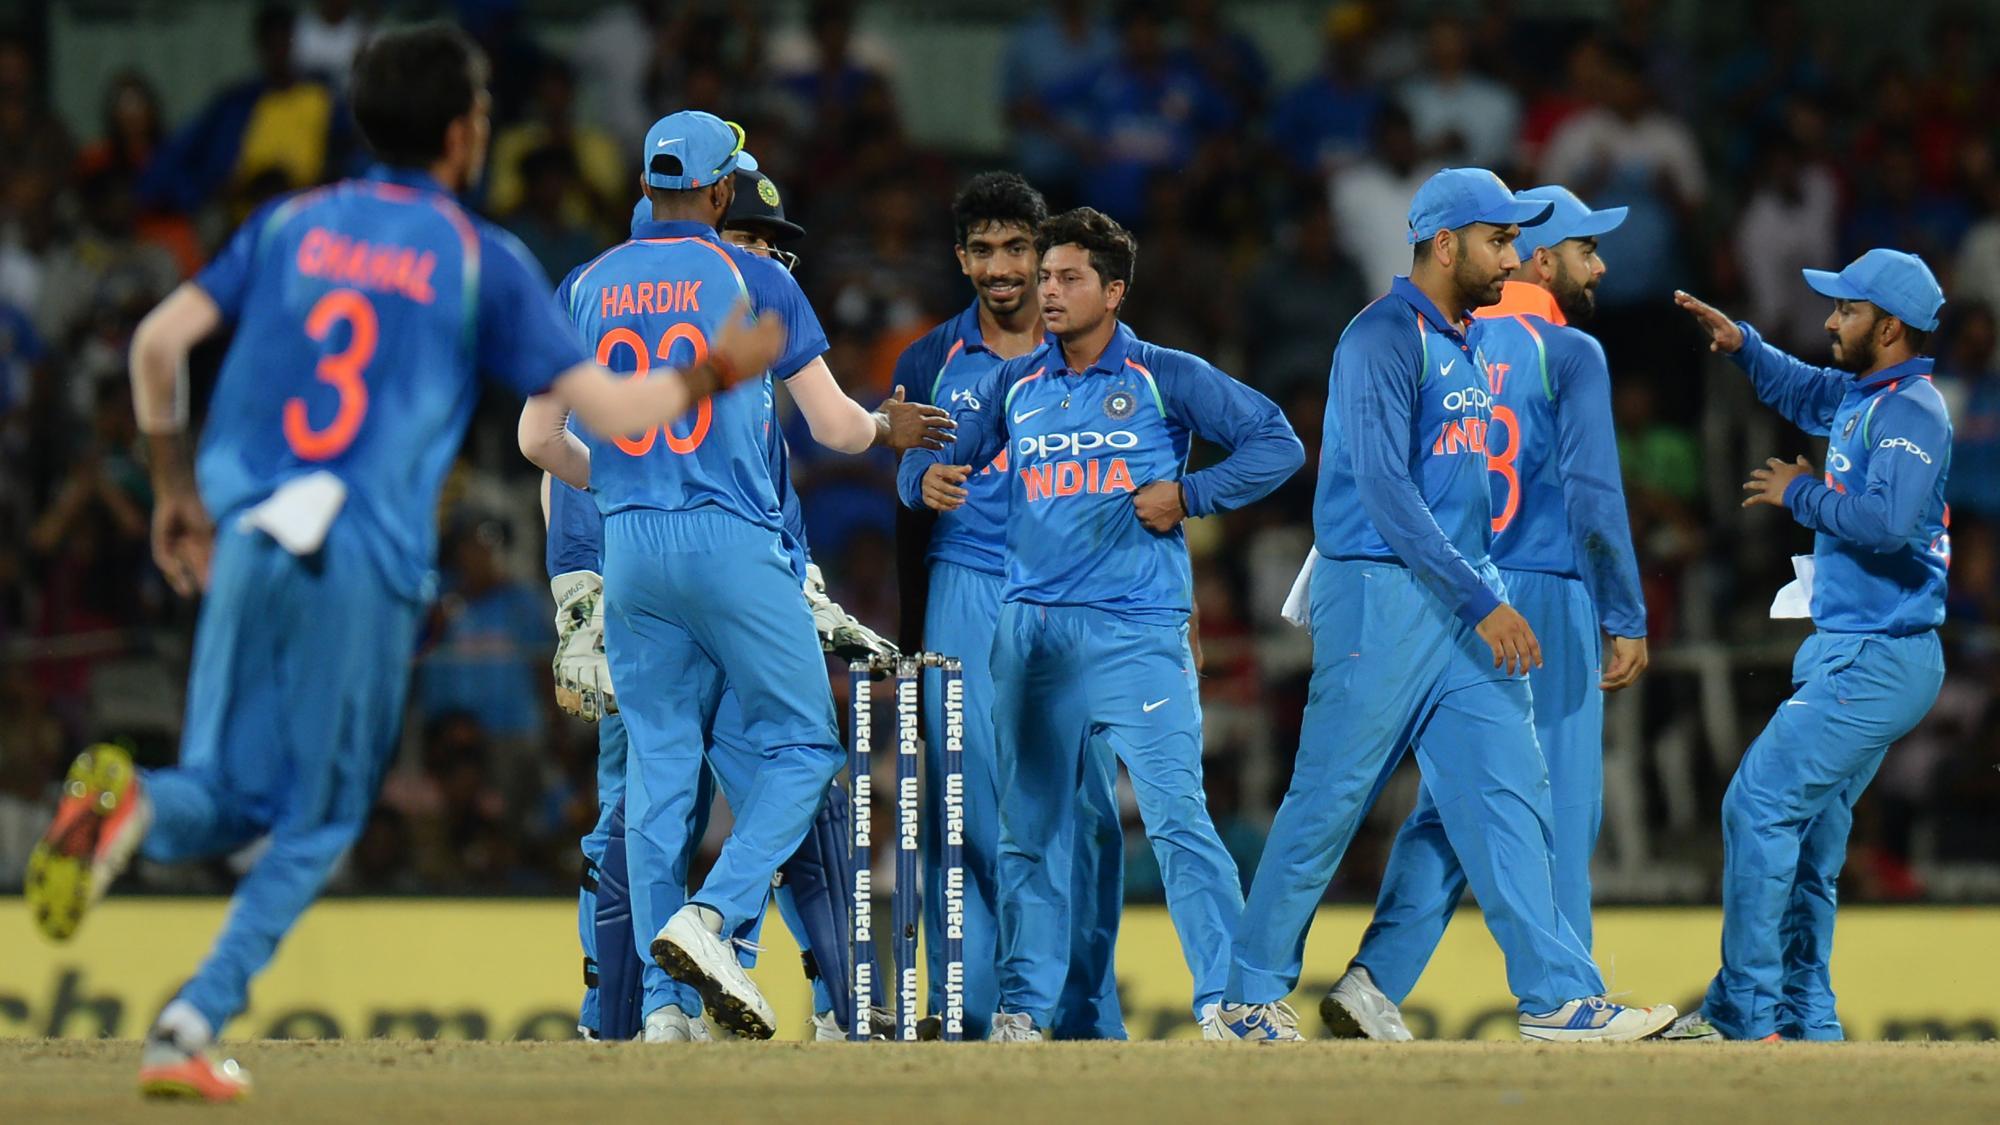 Indian bowlers back Pandya, Dhoni's resurgence